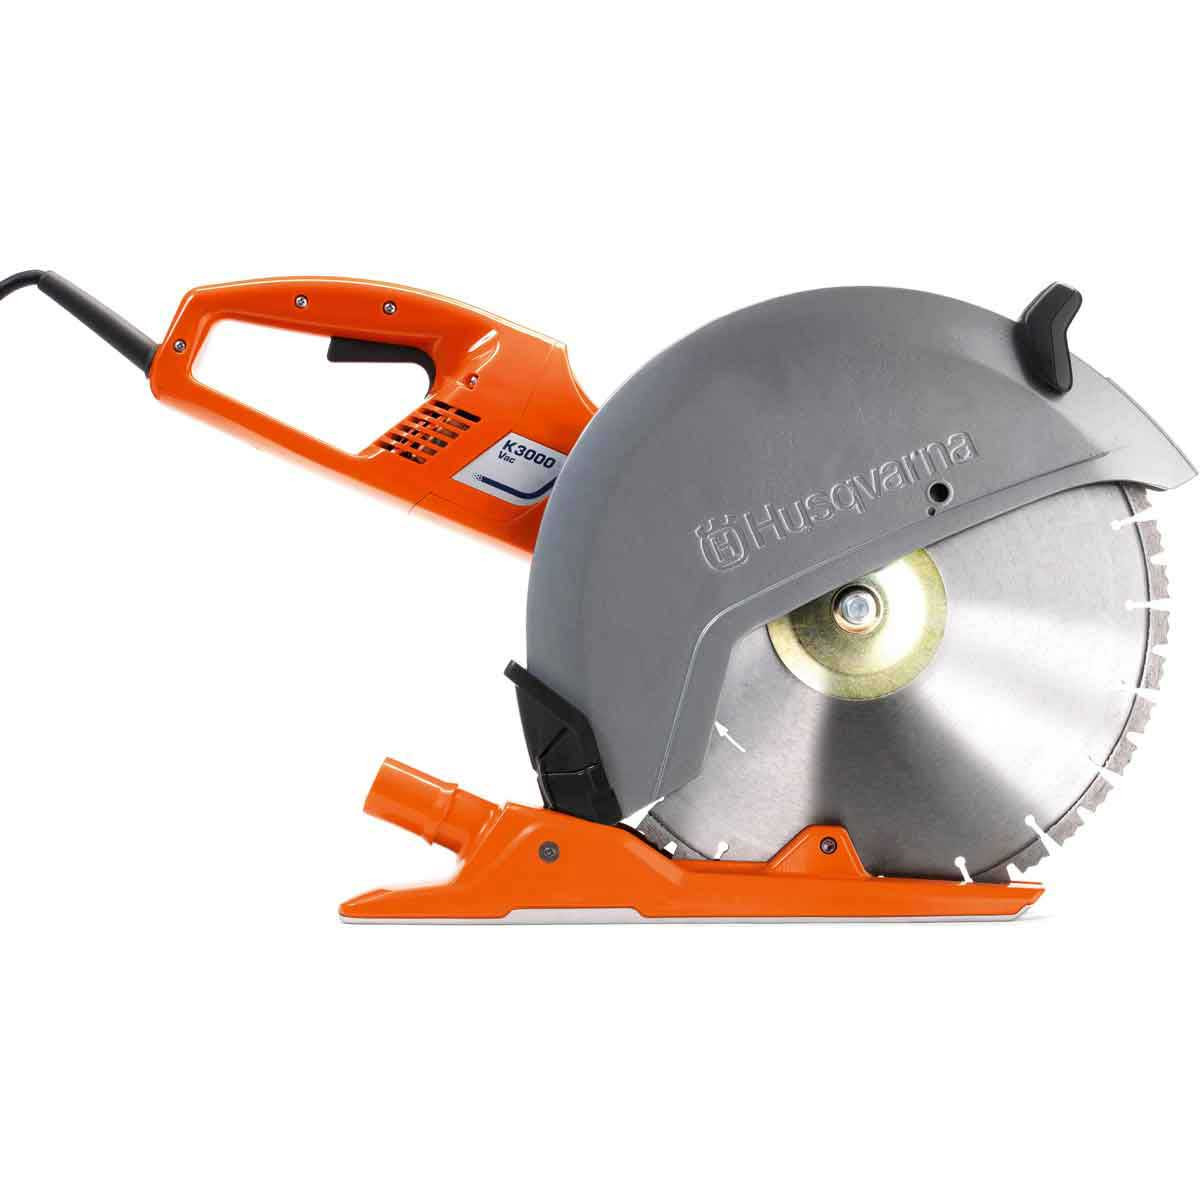 Husqvarna K3000 Dry Electric saw